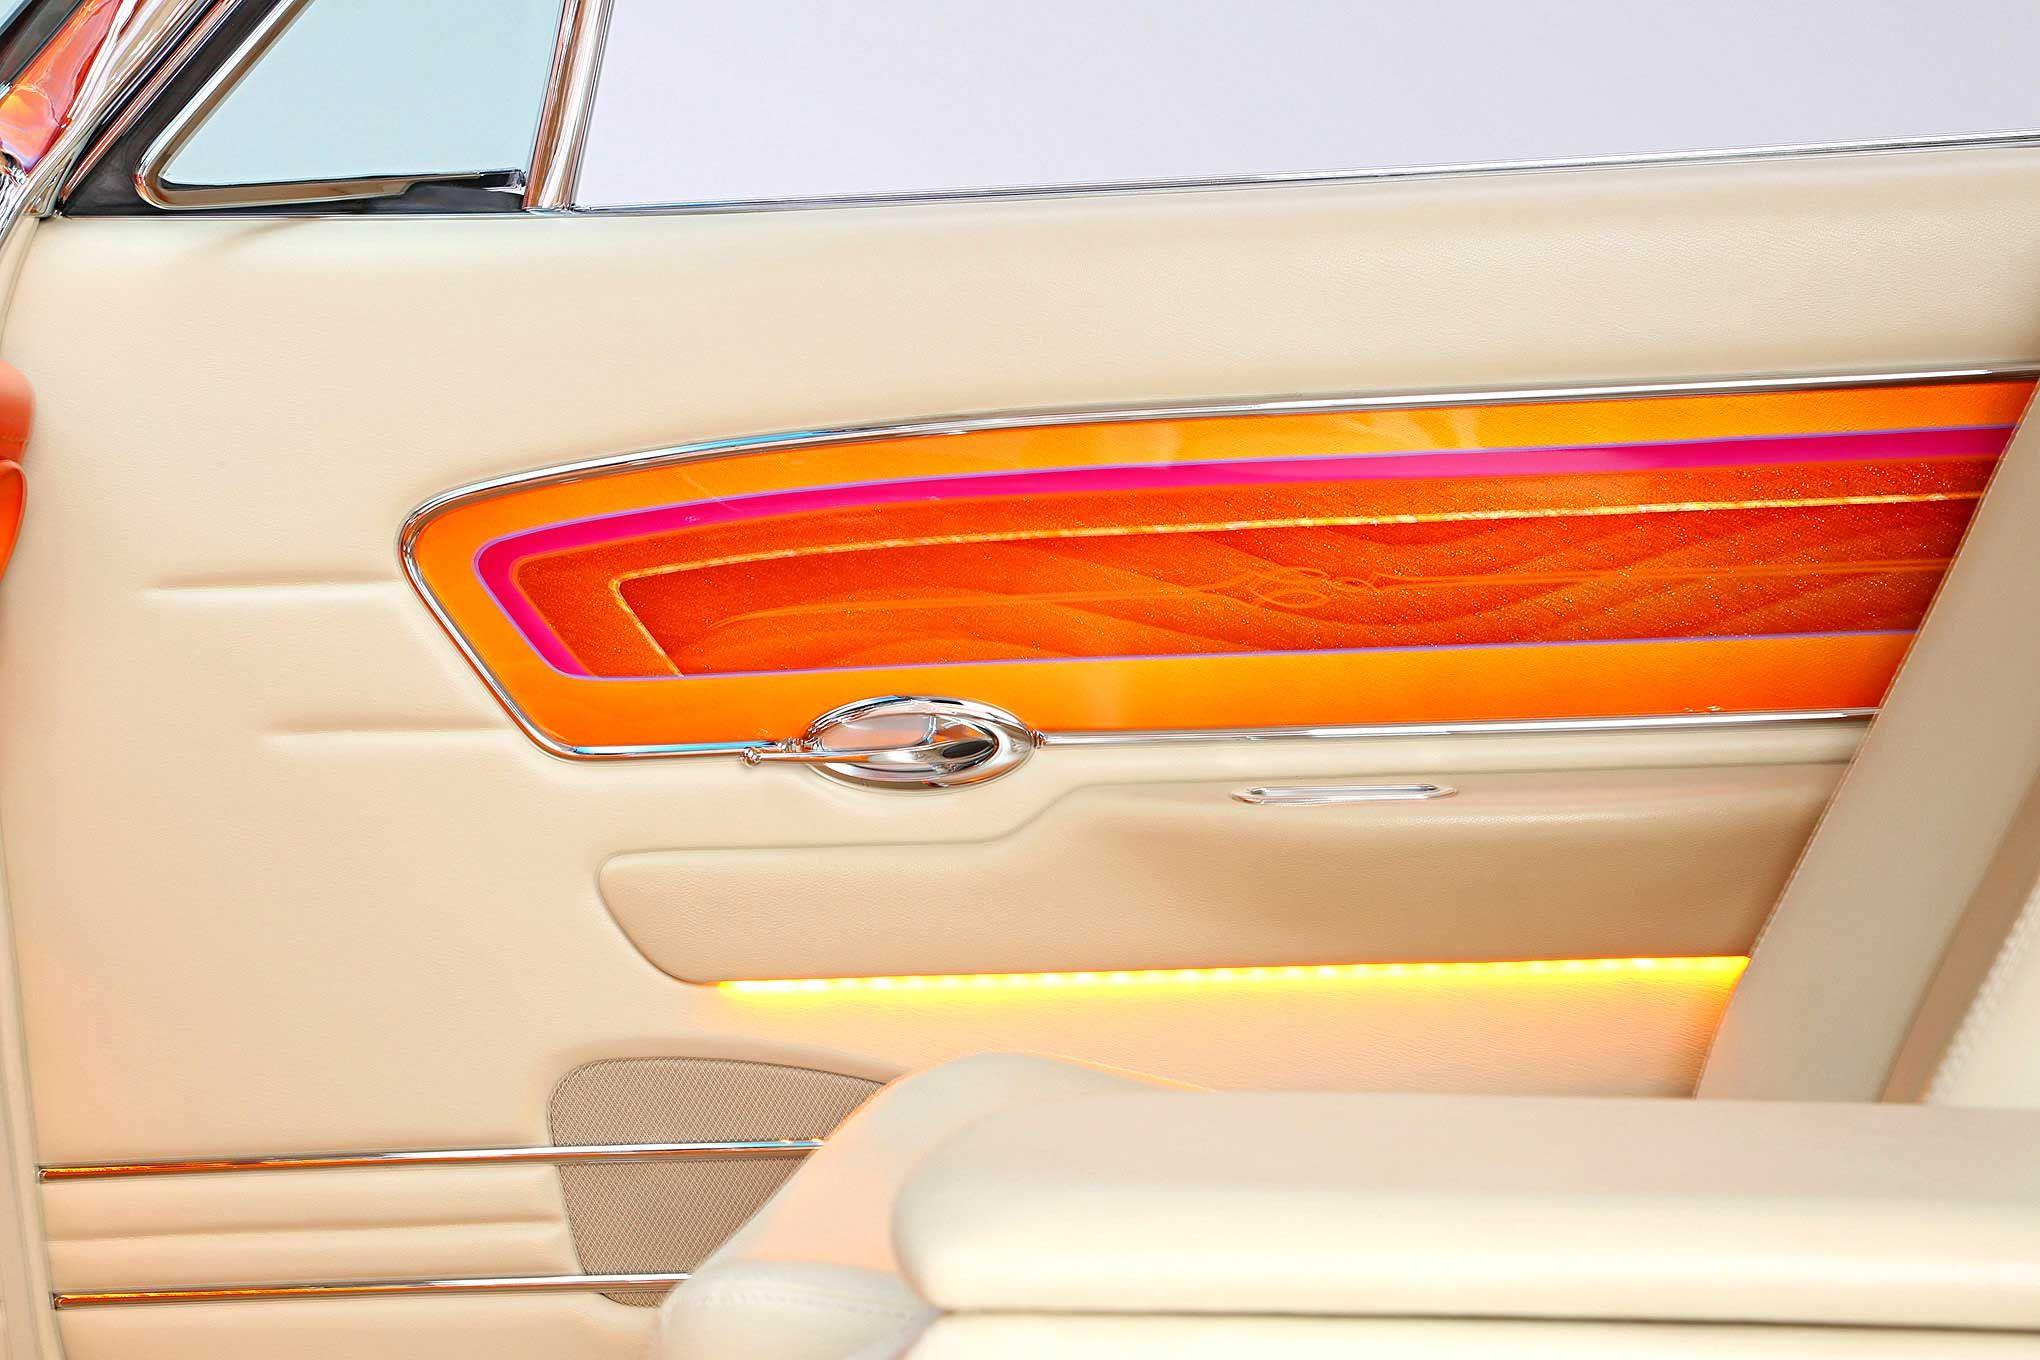 1964 Chevrolet Impala Super Sport The Golden Rose In 2020 Chevrolet Impala Impala Super Sport